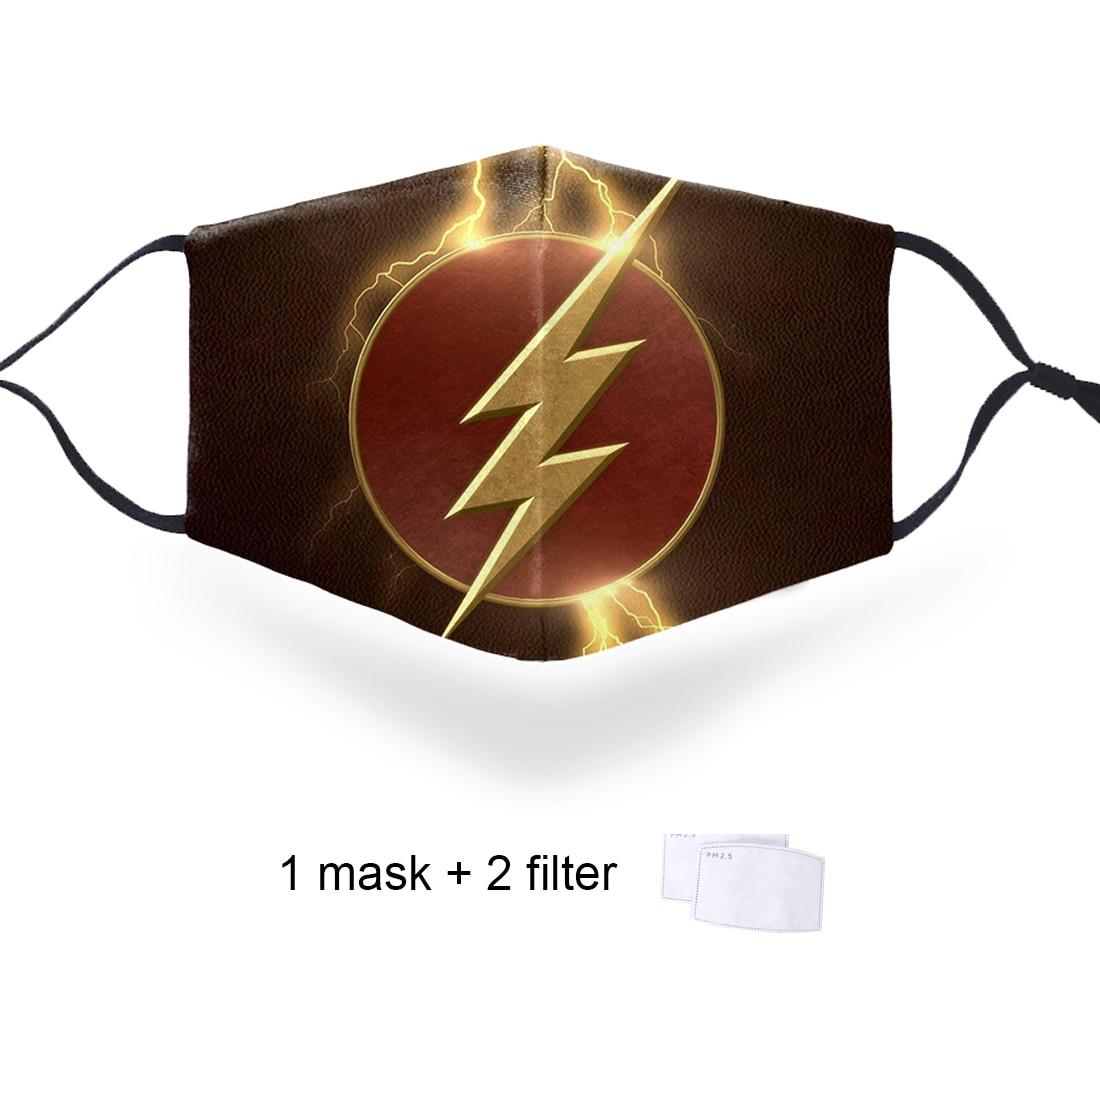 Superhero Spiderman Print Masks PM2.5 Filter Mouth Face Masks Marvel Protective PM2.5 Filter Mouth-Muffle Mask Dust Face Masks